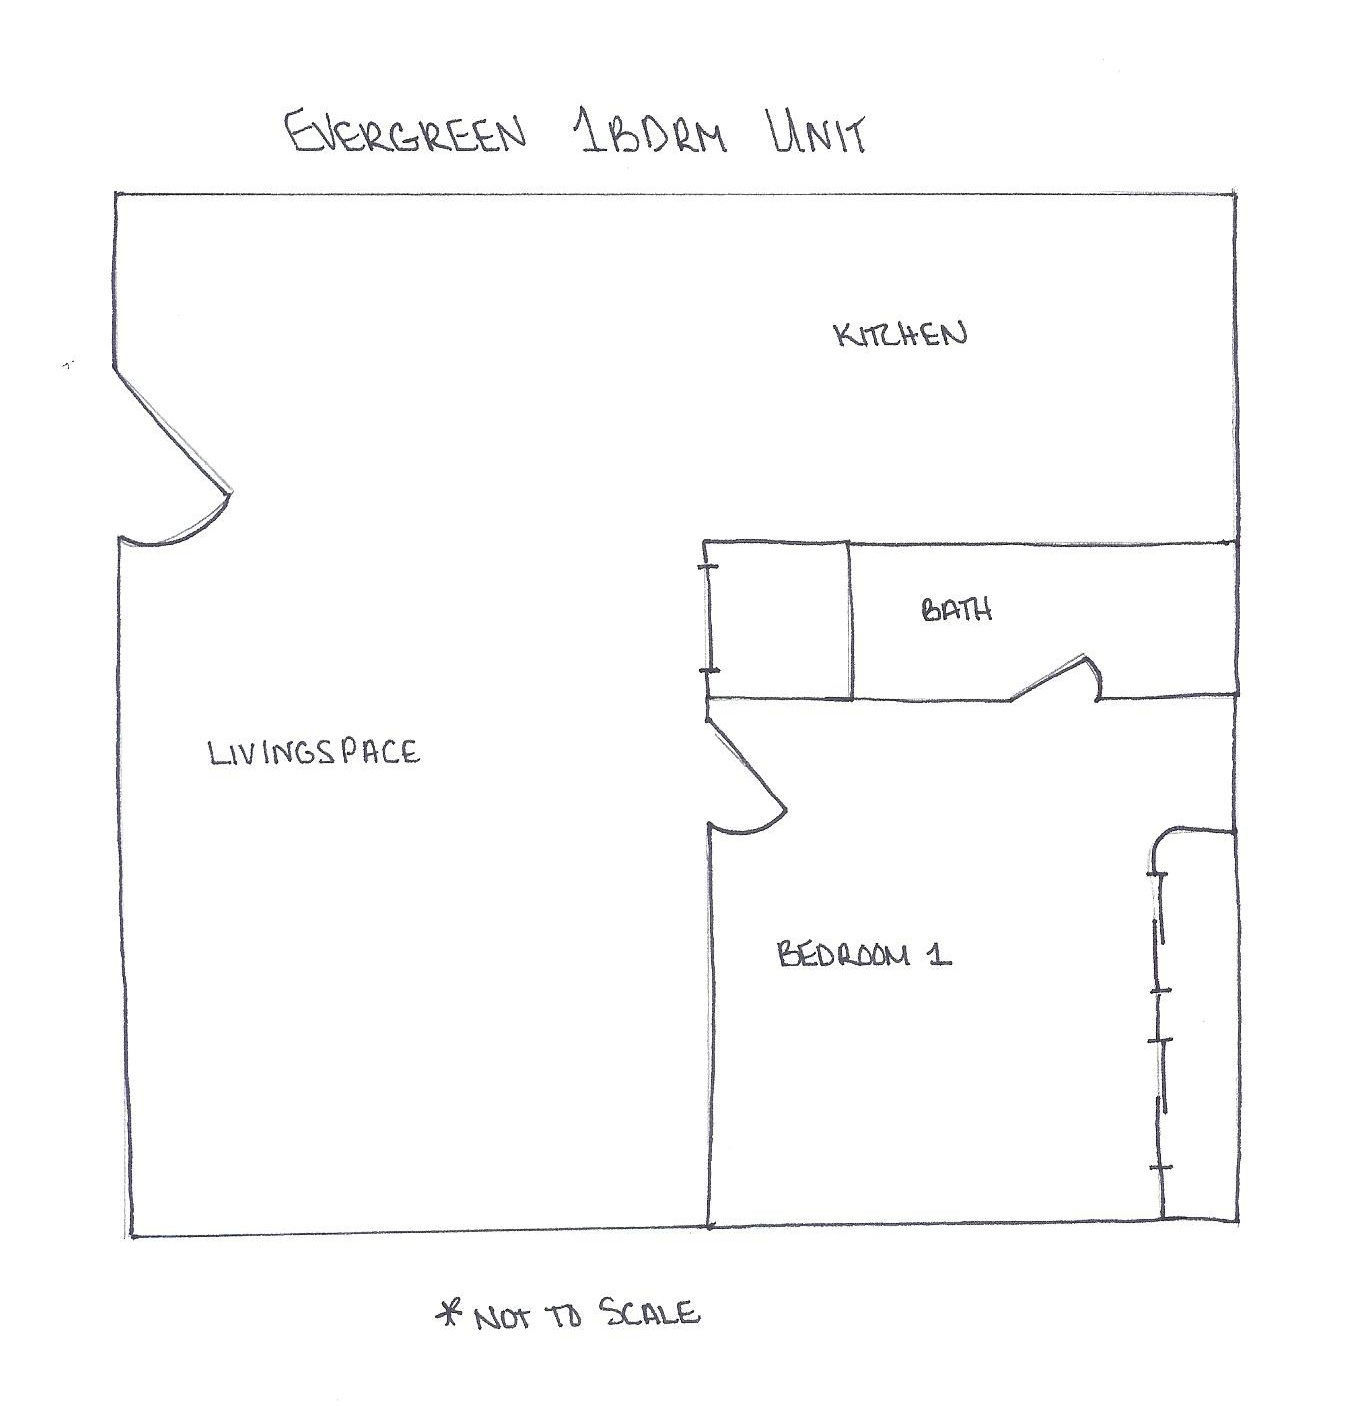 Basic Floor Plan Amc Tiao Property Management Manhattan Ks